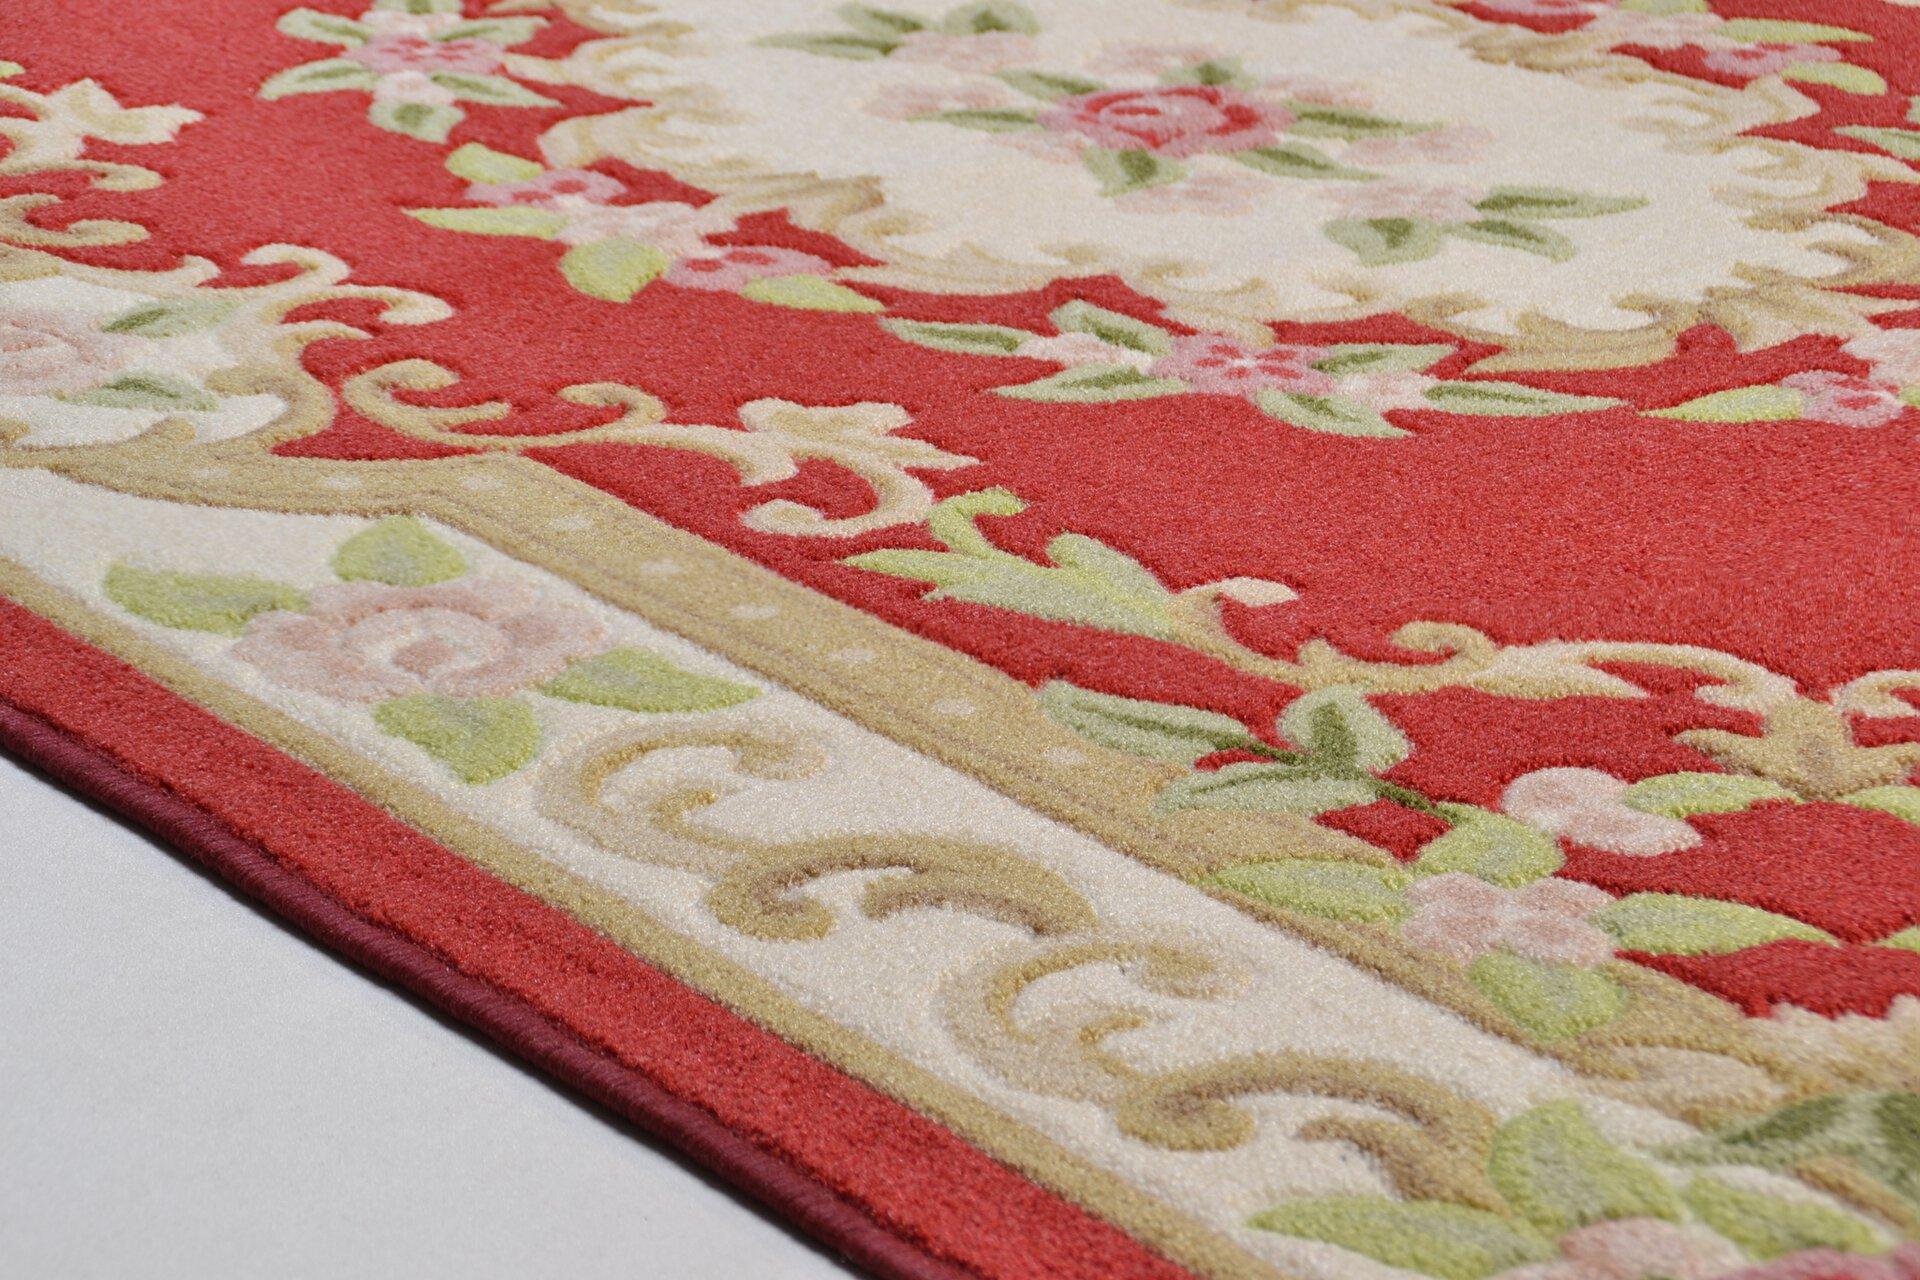 Maschinenwebteppich Versailles Theko Textil rot 1 x 1 cm